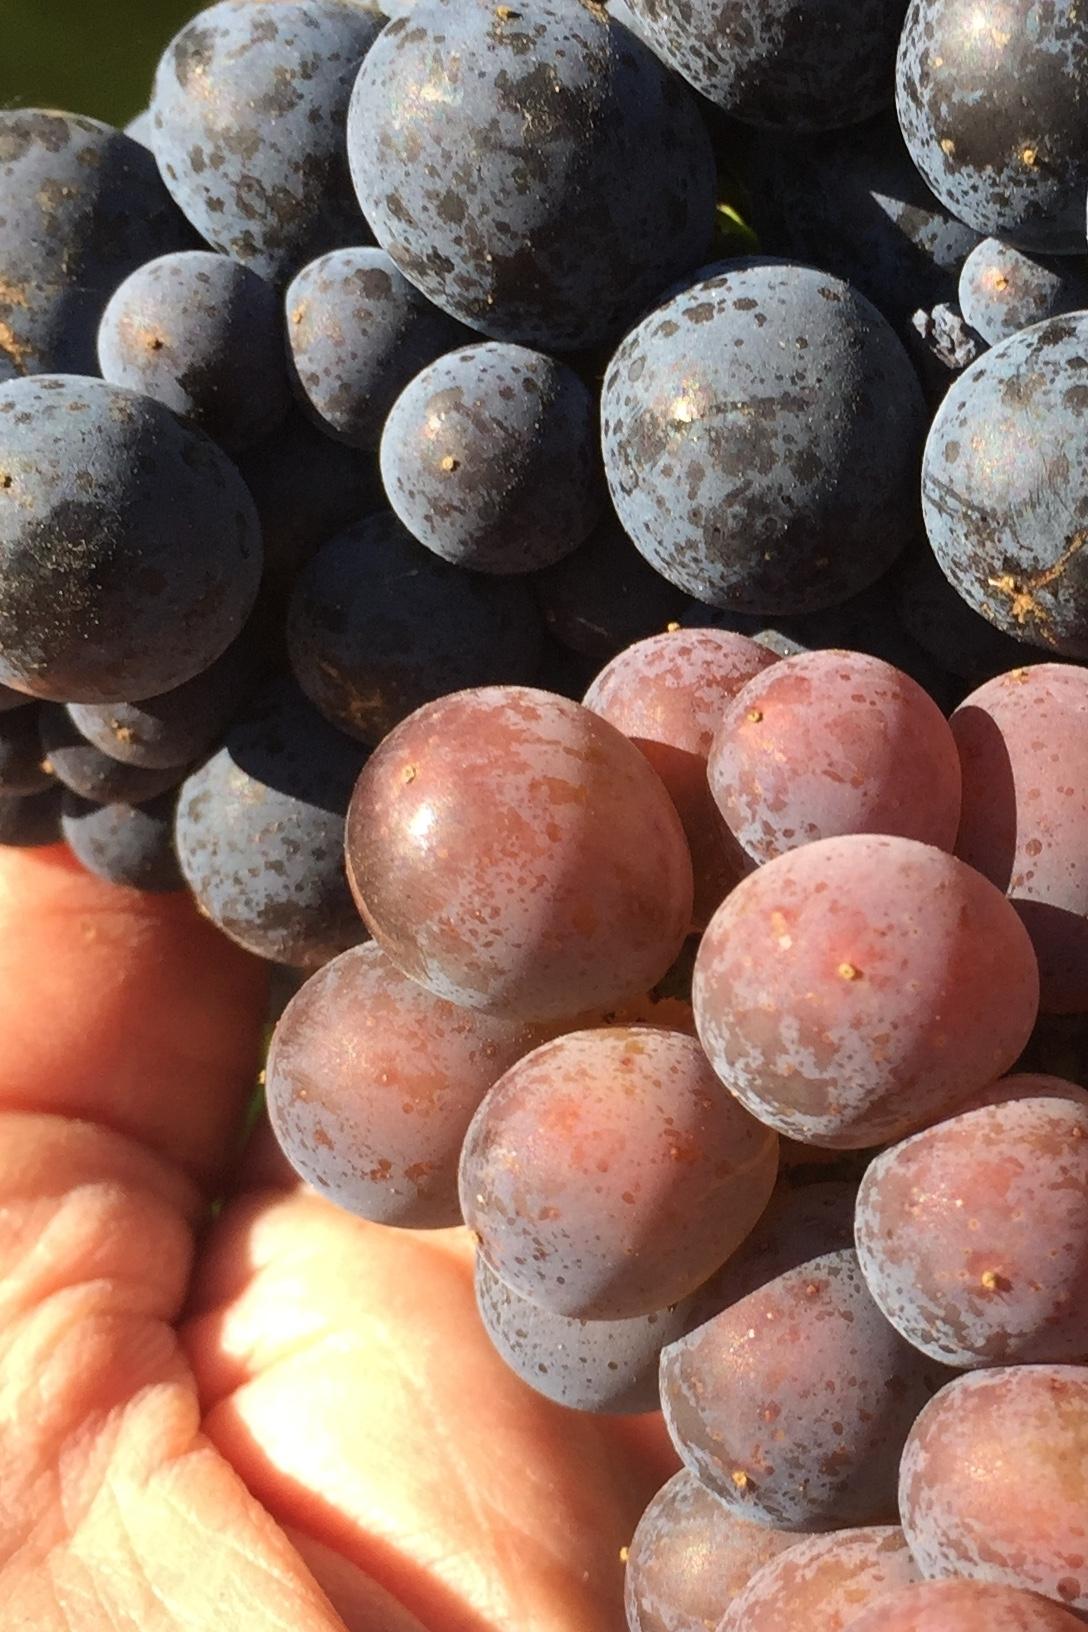 Pinot Noir & Pinot Gris in hand